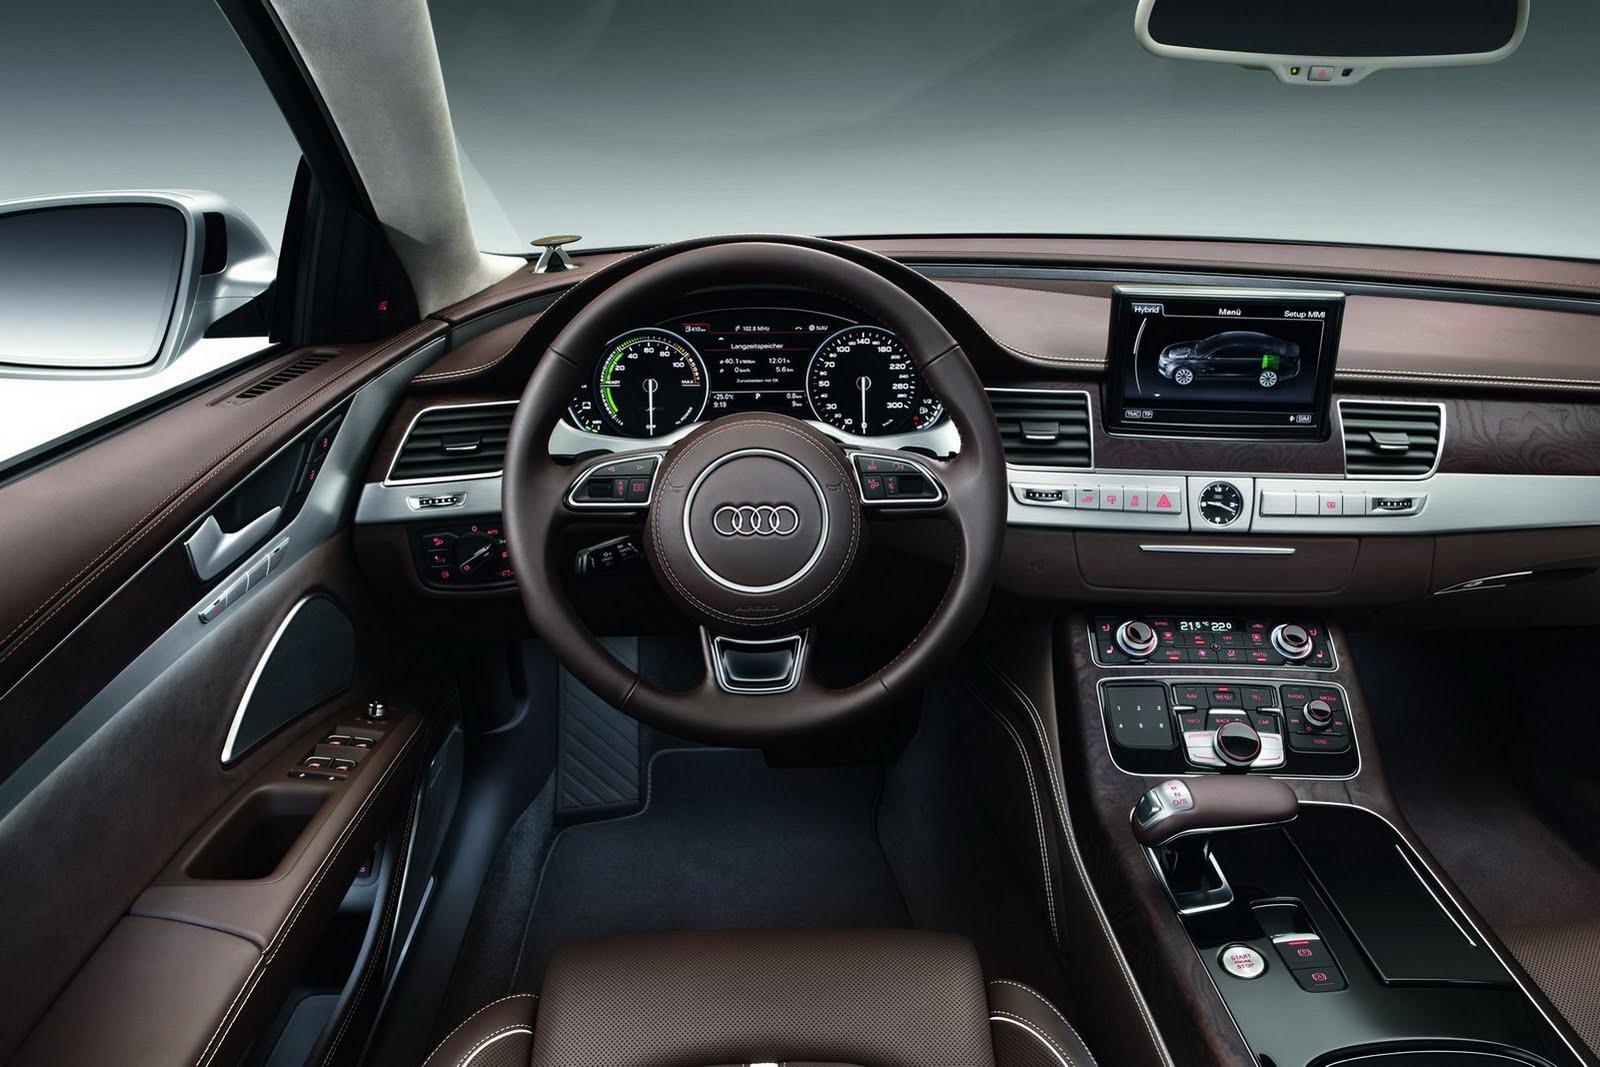 New-Audi-A8-Hybrid-interior -4